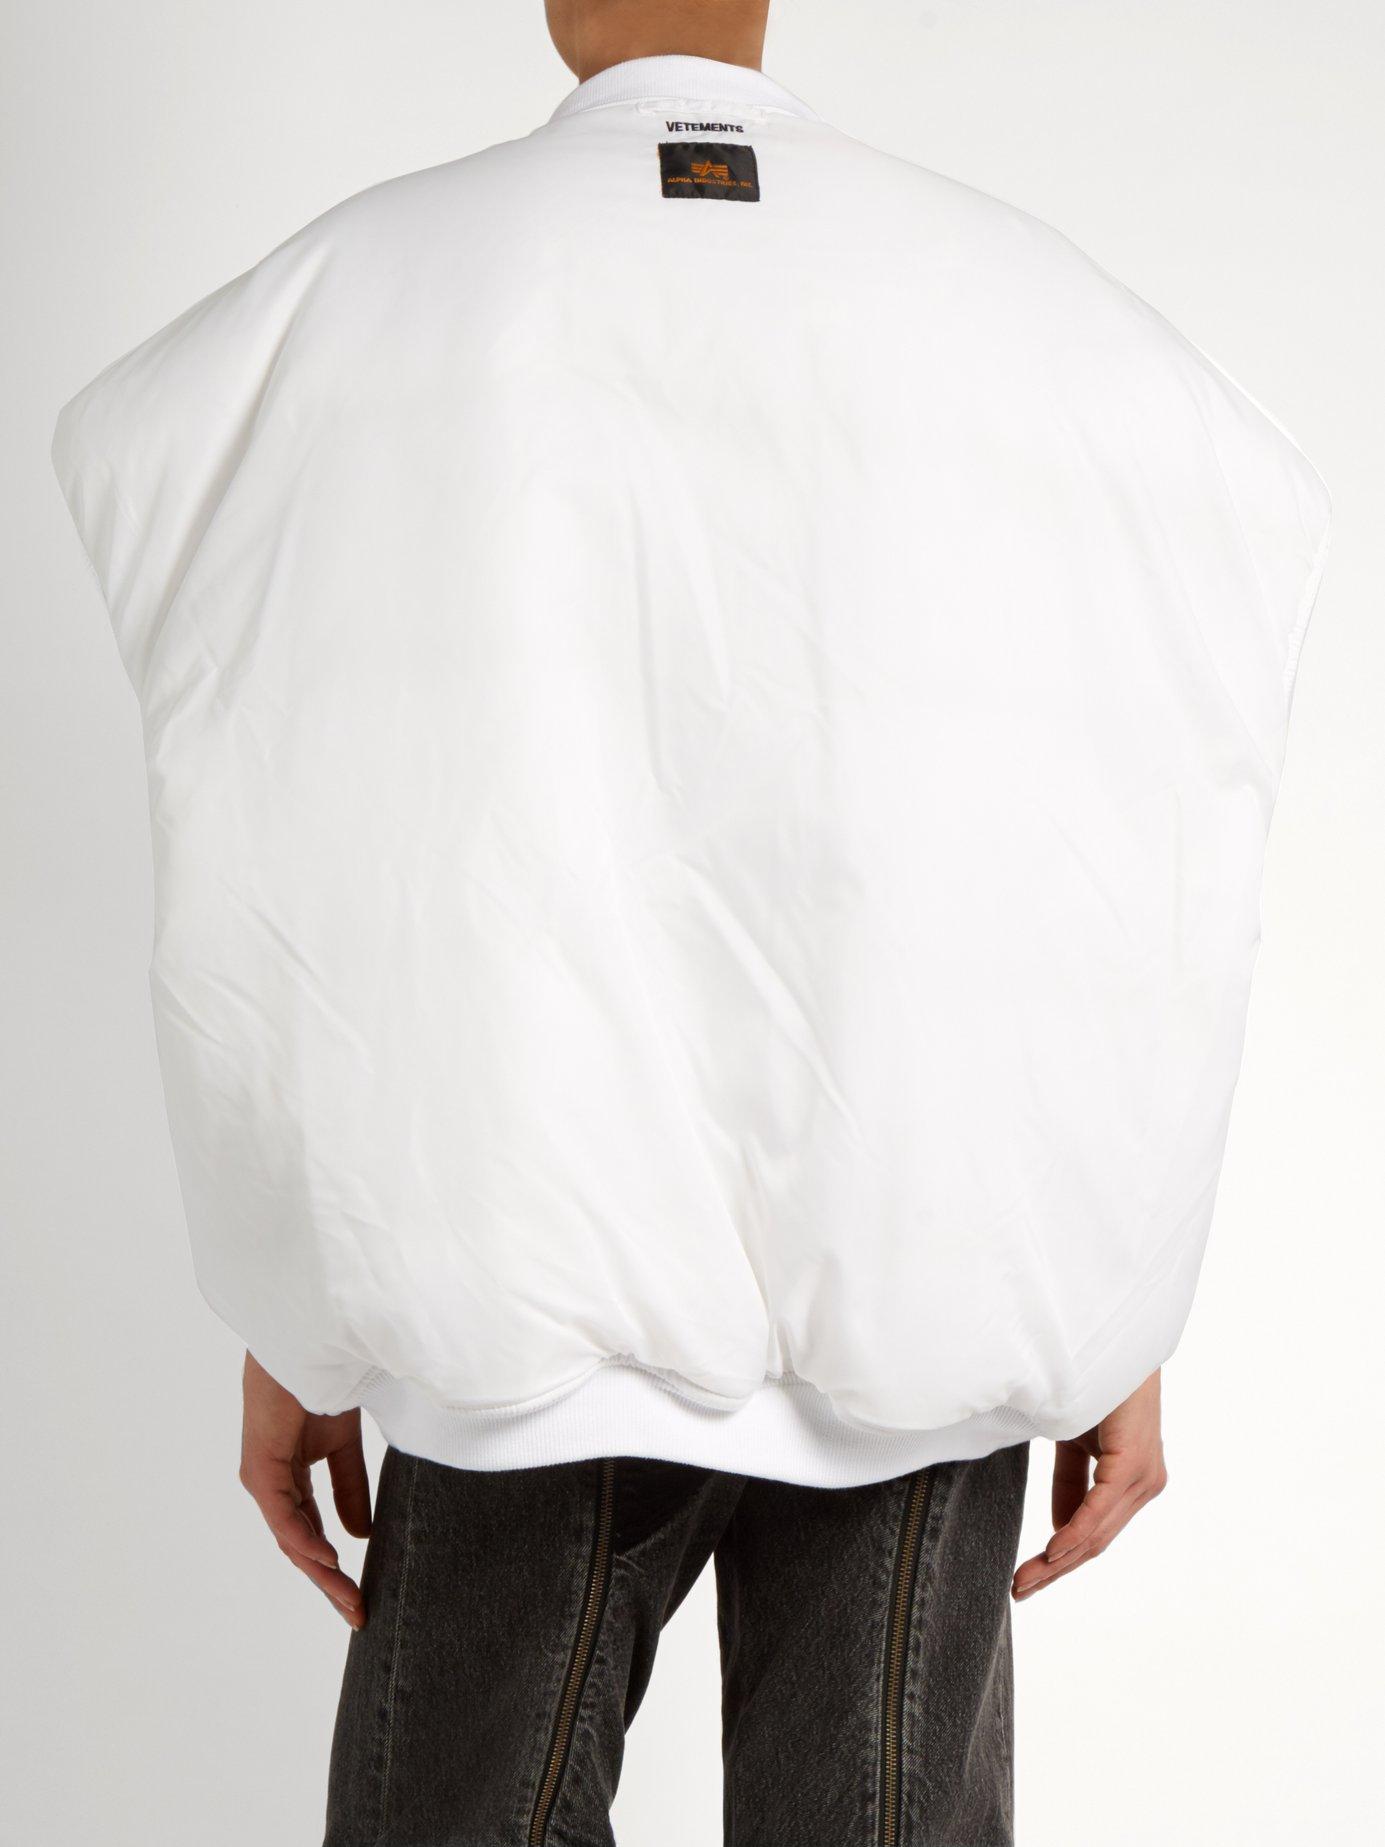 X Alpha Industries sleeveless bomber jacket by Vetements